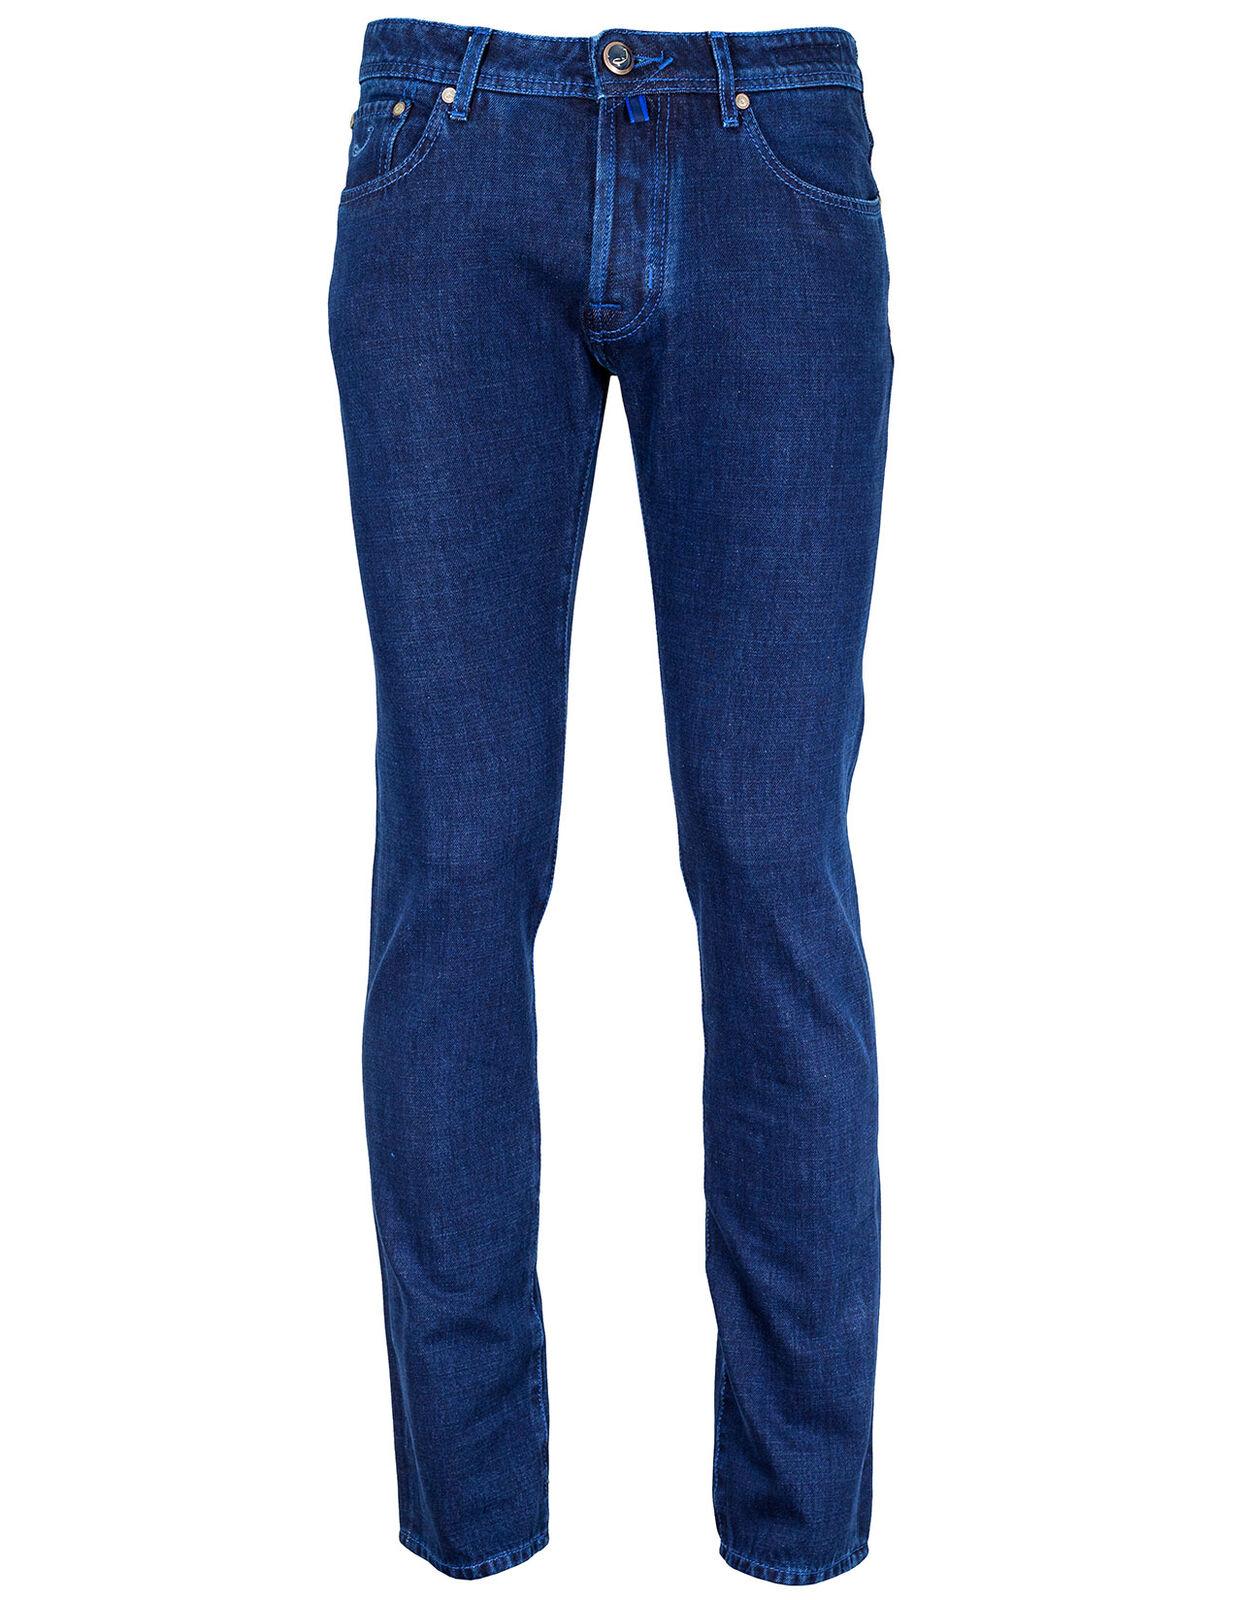 Jacob Cohen Jeans PW688 Comfort in in in dunkelblau | Creative  | Offizielle Webseite  4e6c8e